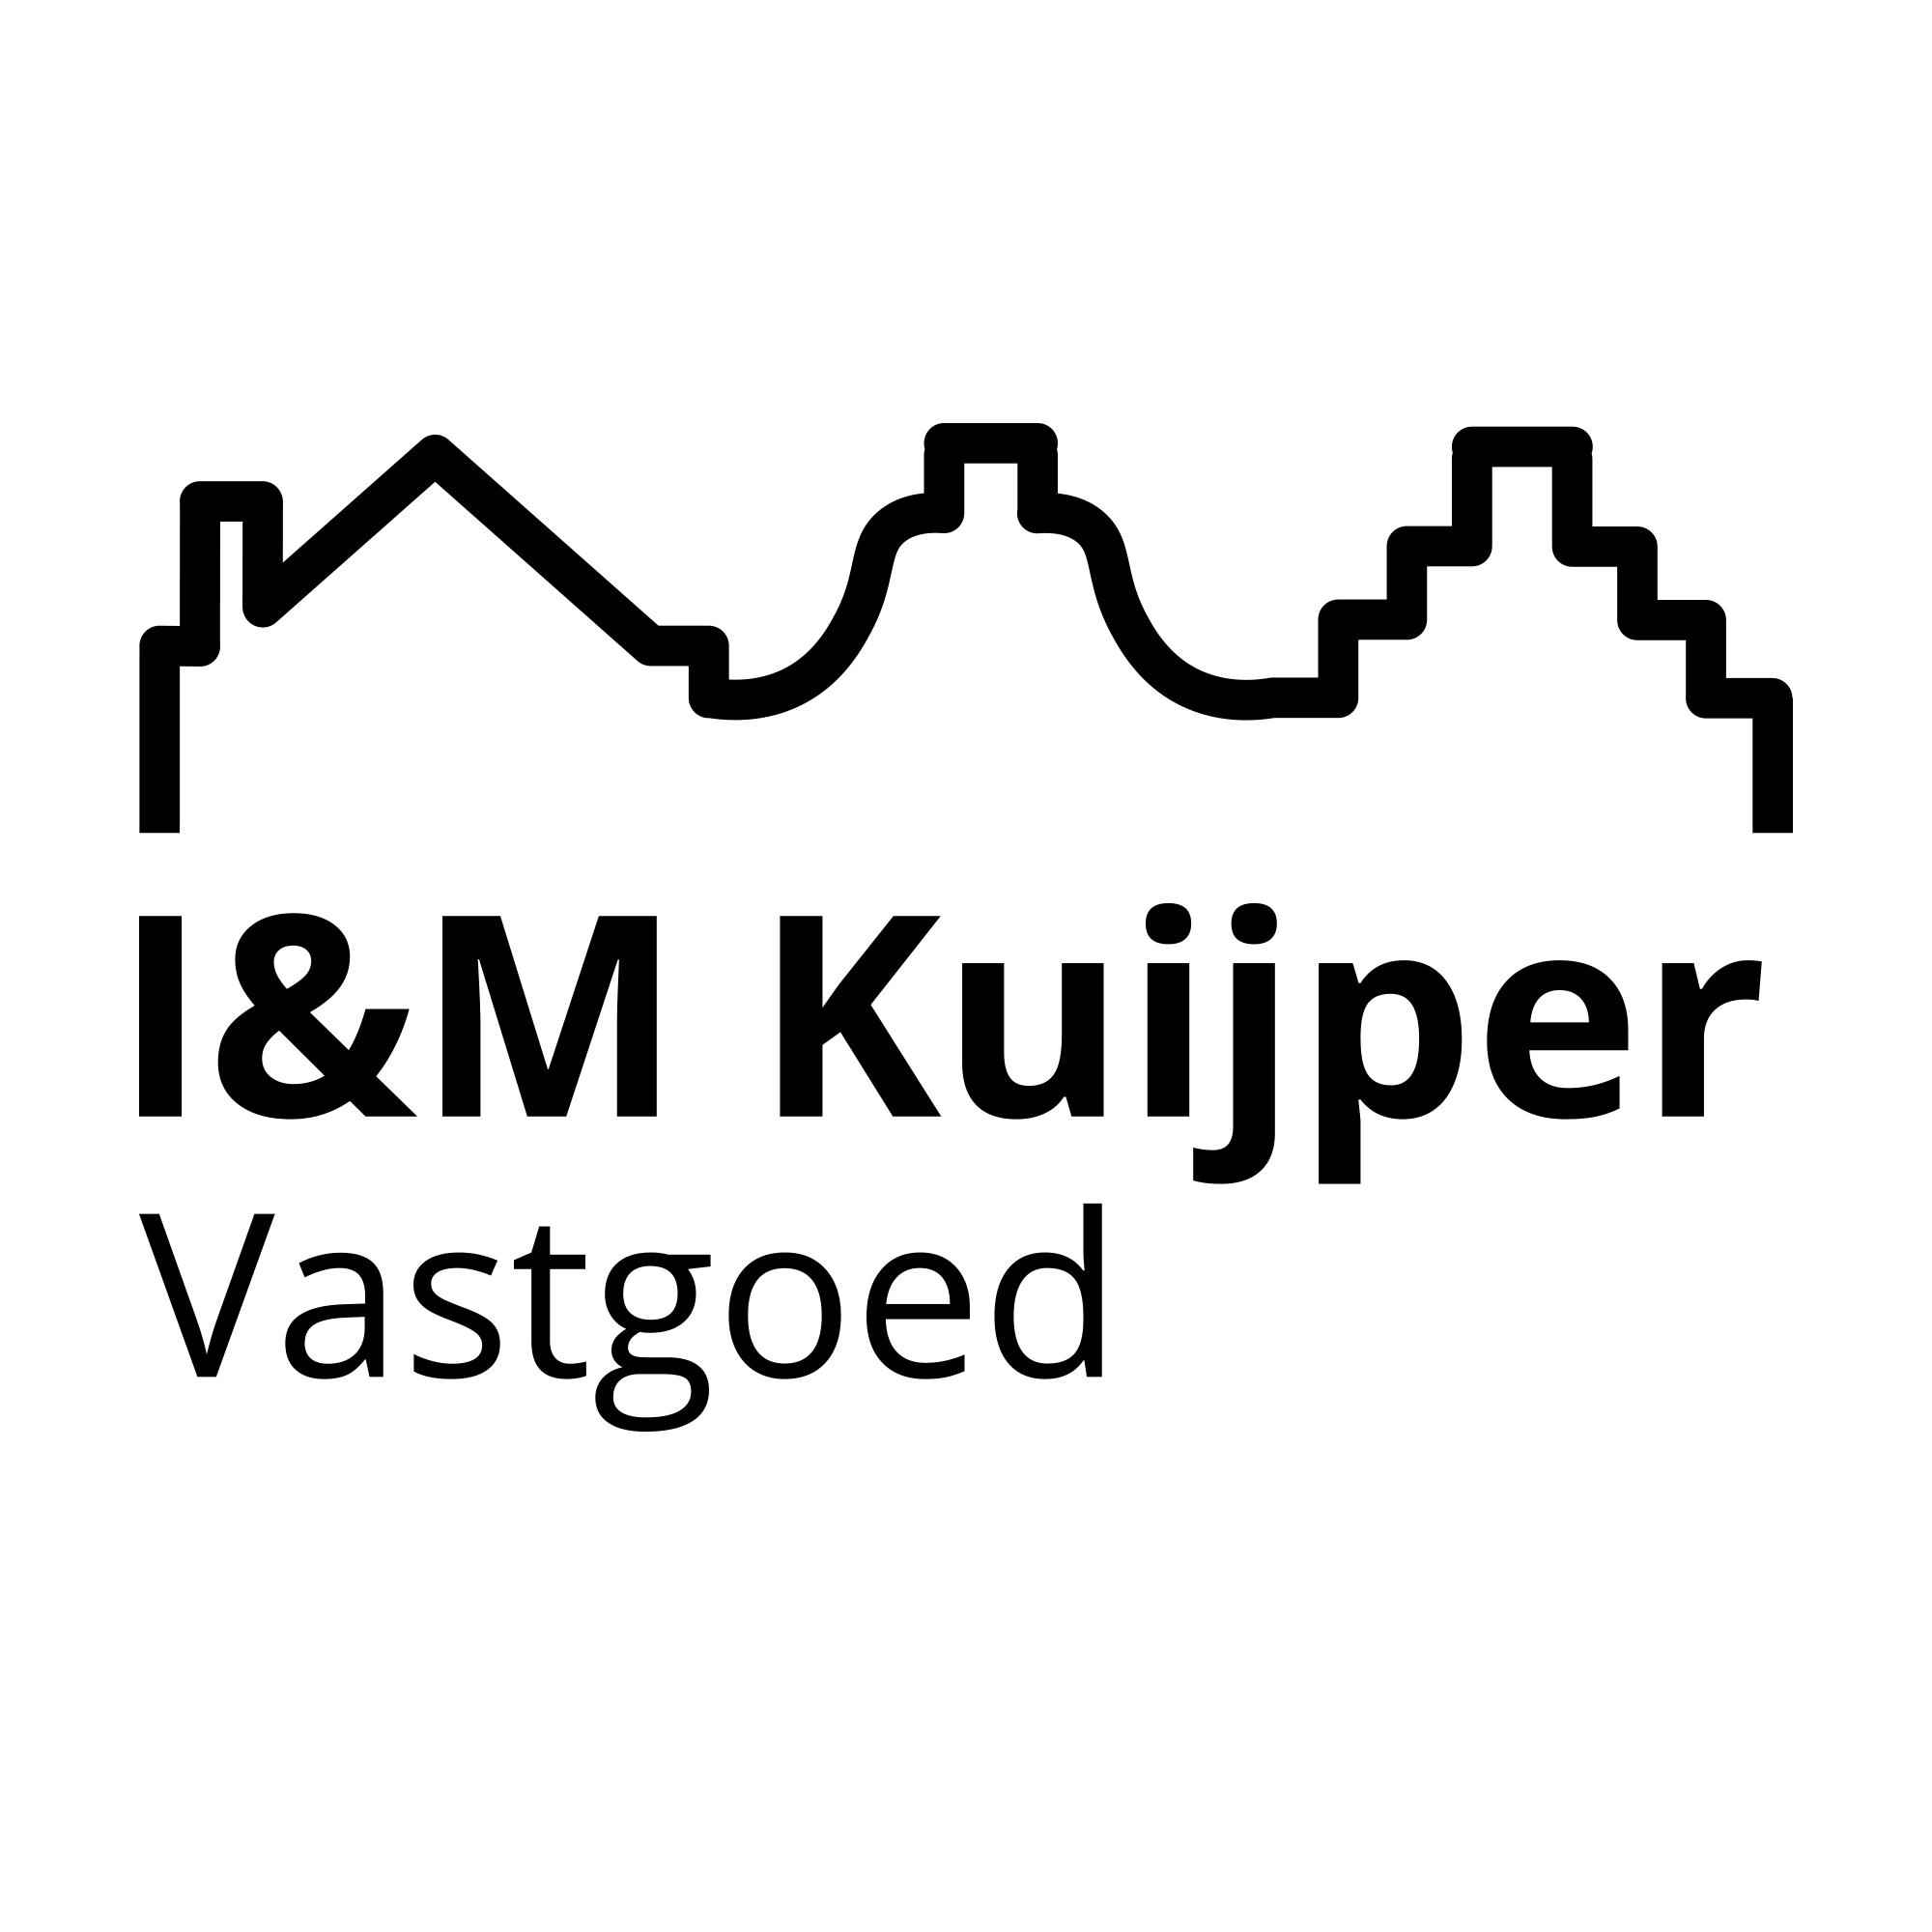 logo-Mockup-made-marketing-portfolio-kuijper